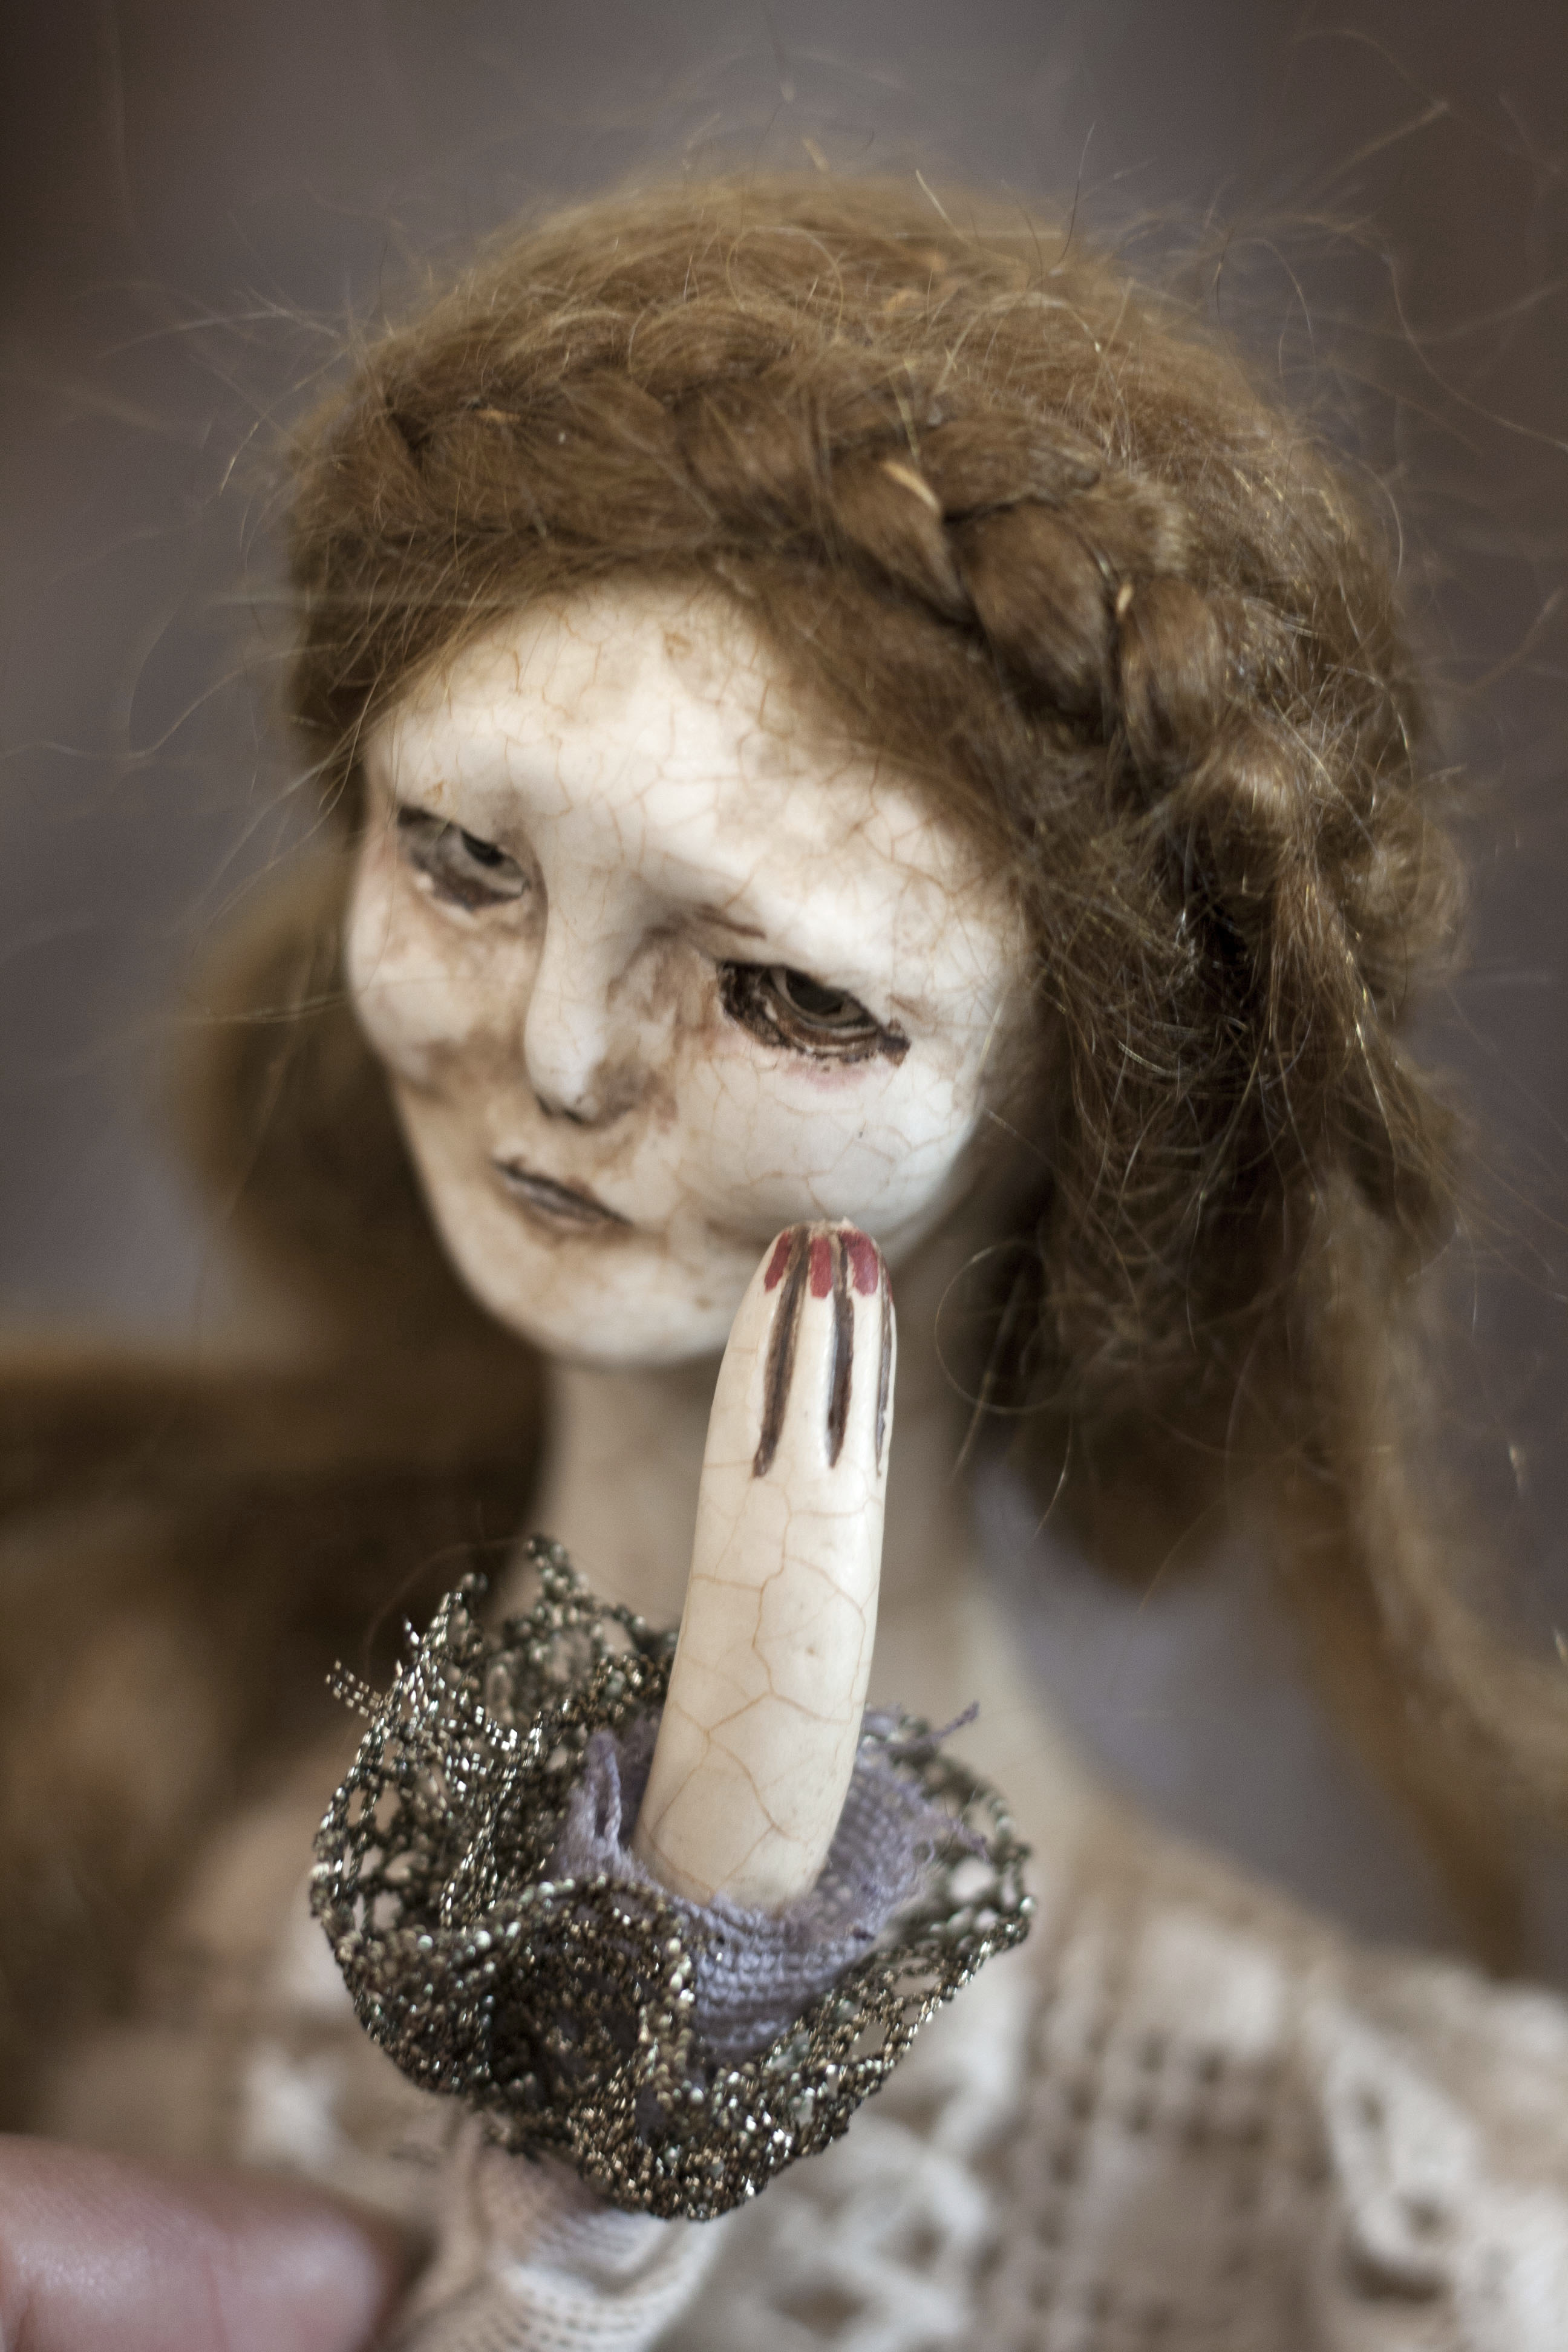 doll art